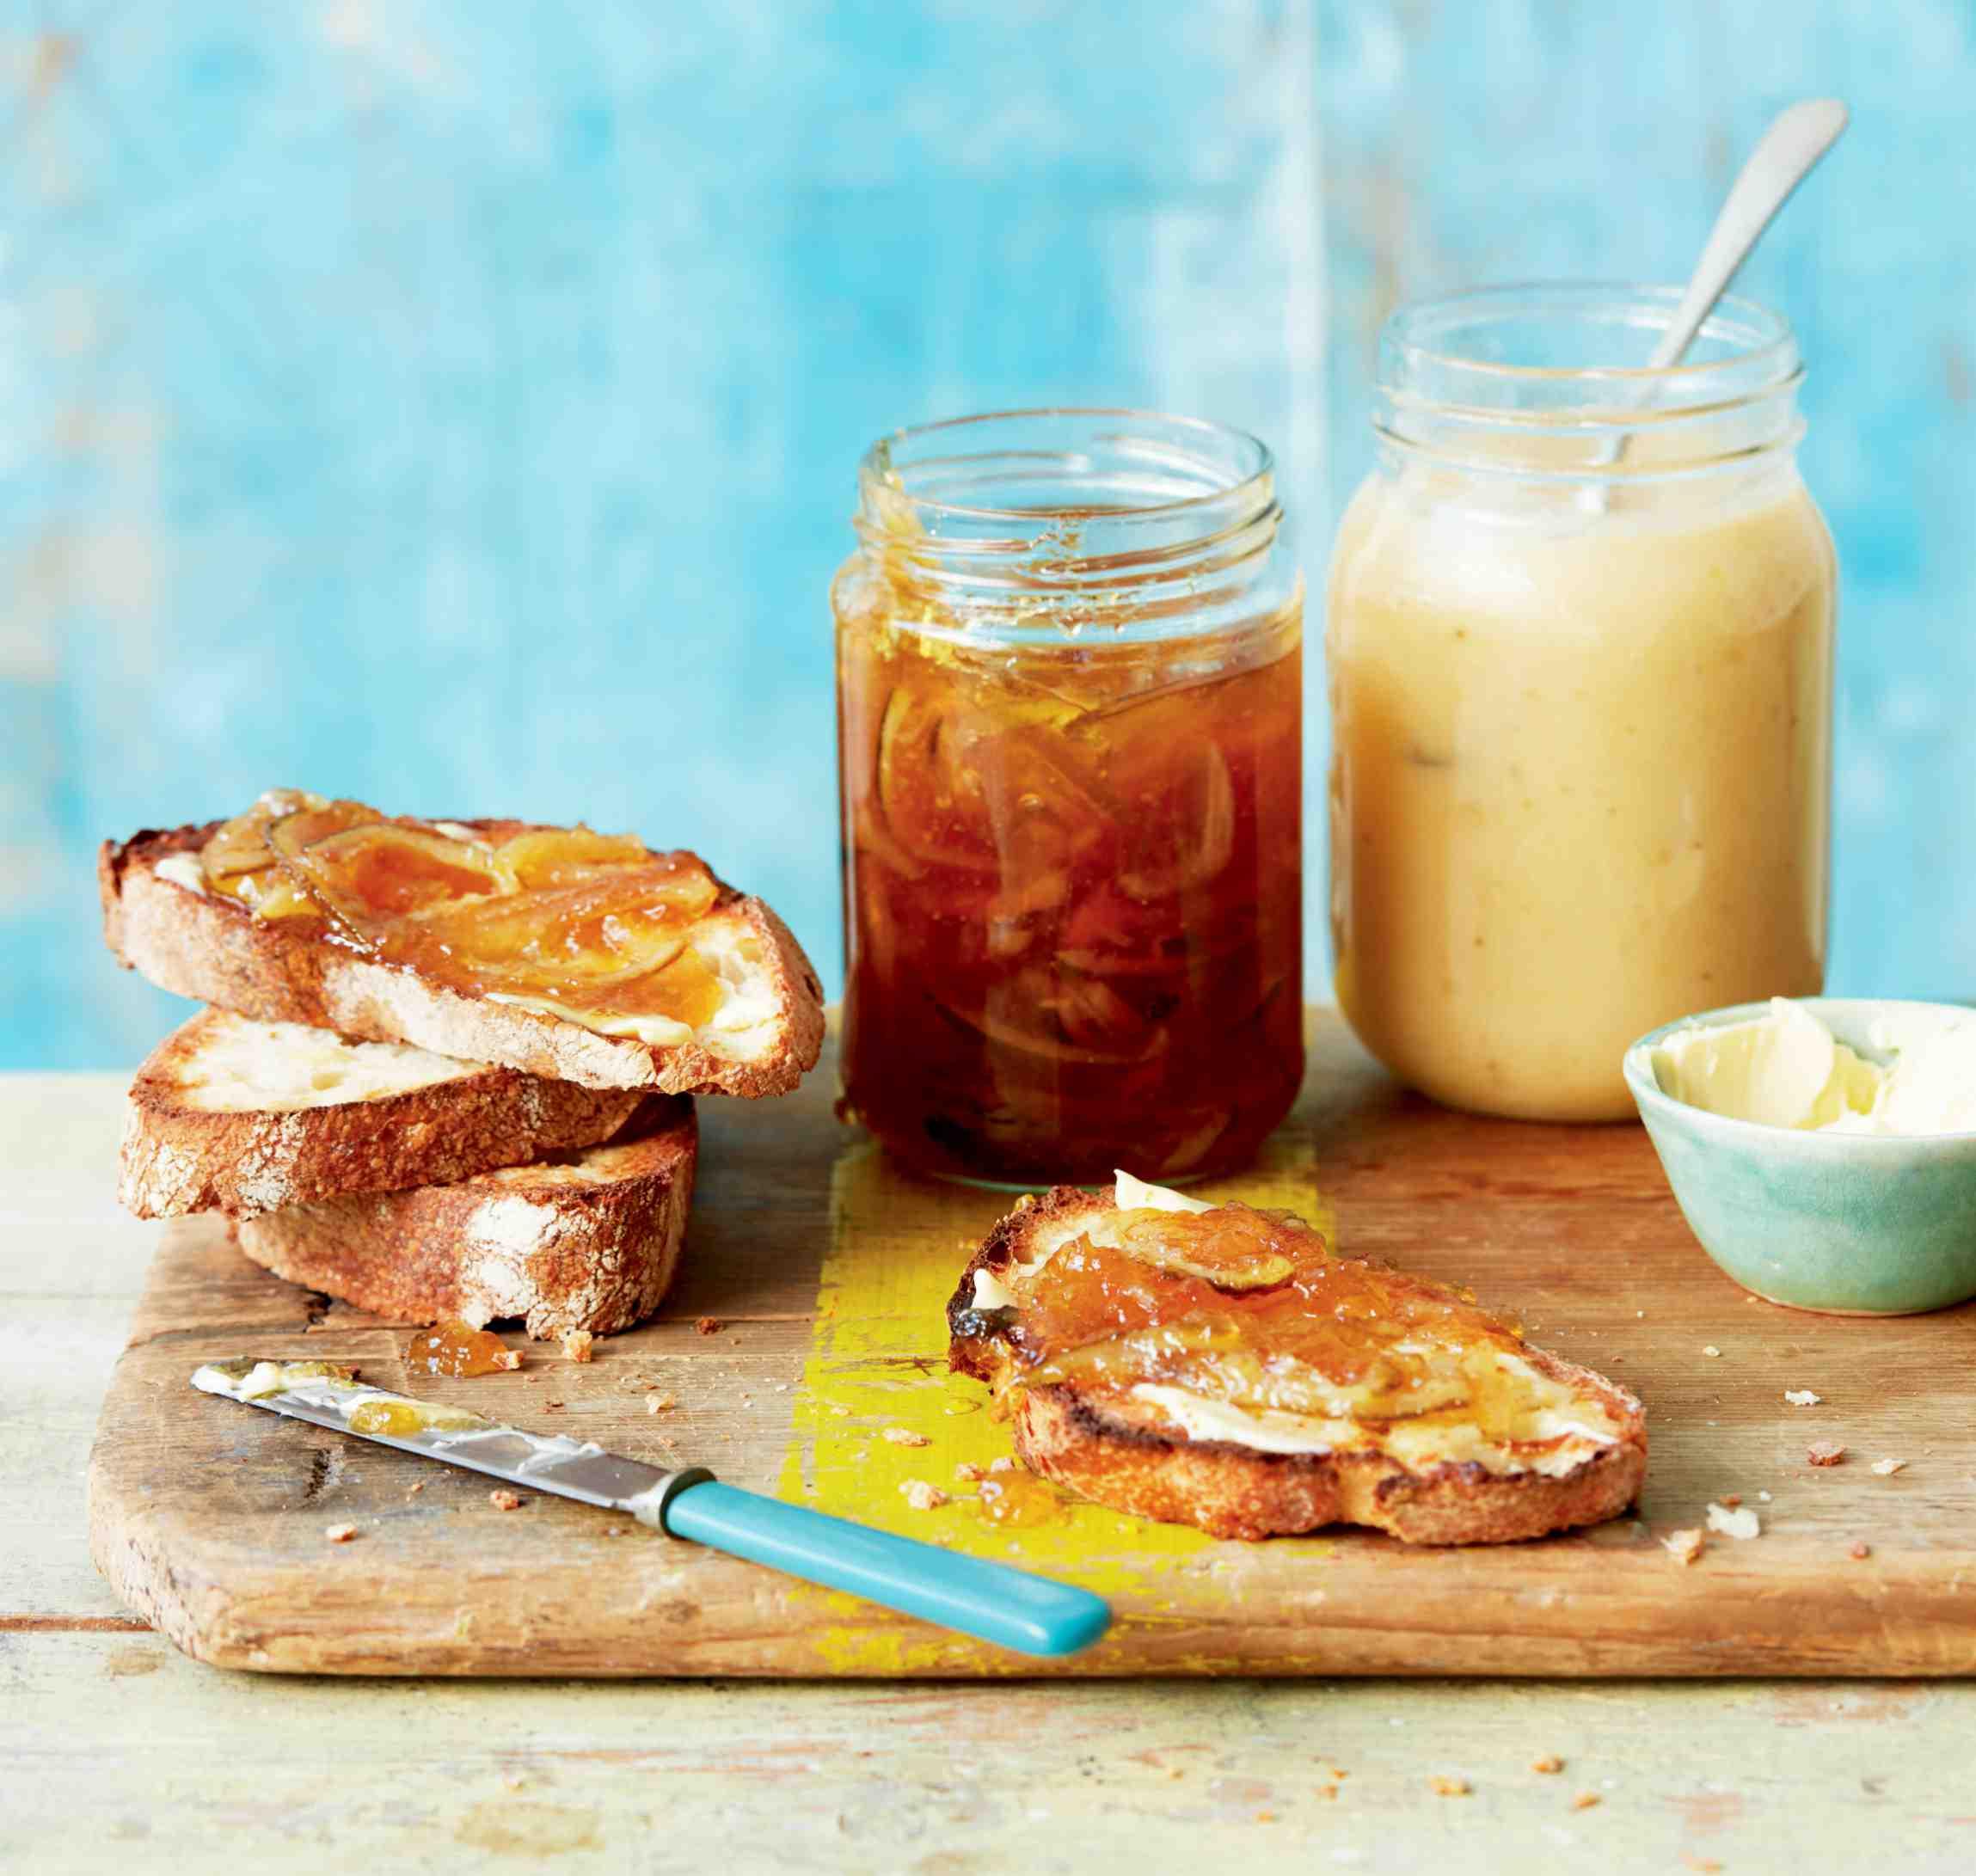 Limetová marmeláda acitronovo-banánová pomazánka